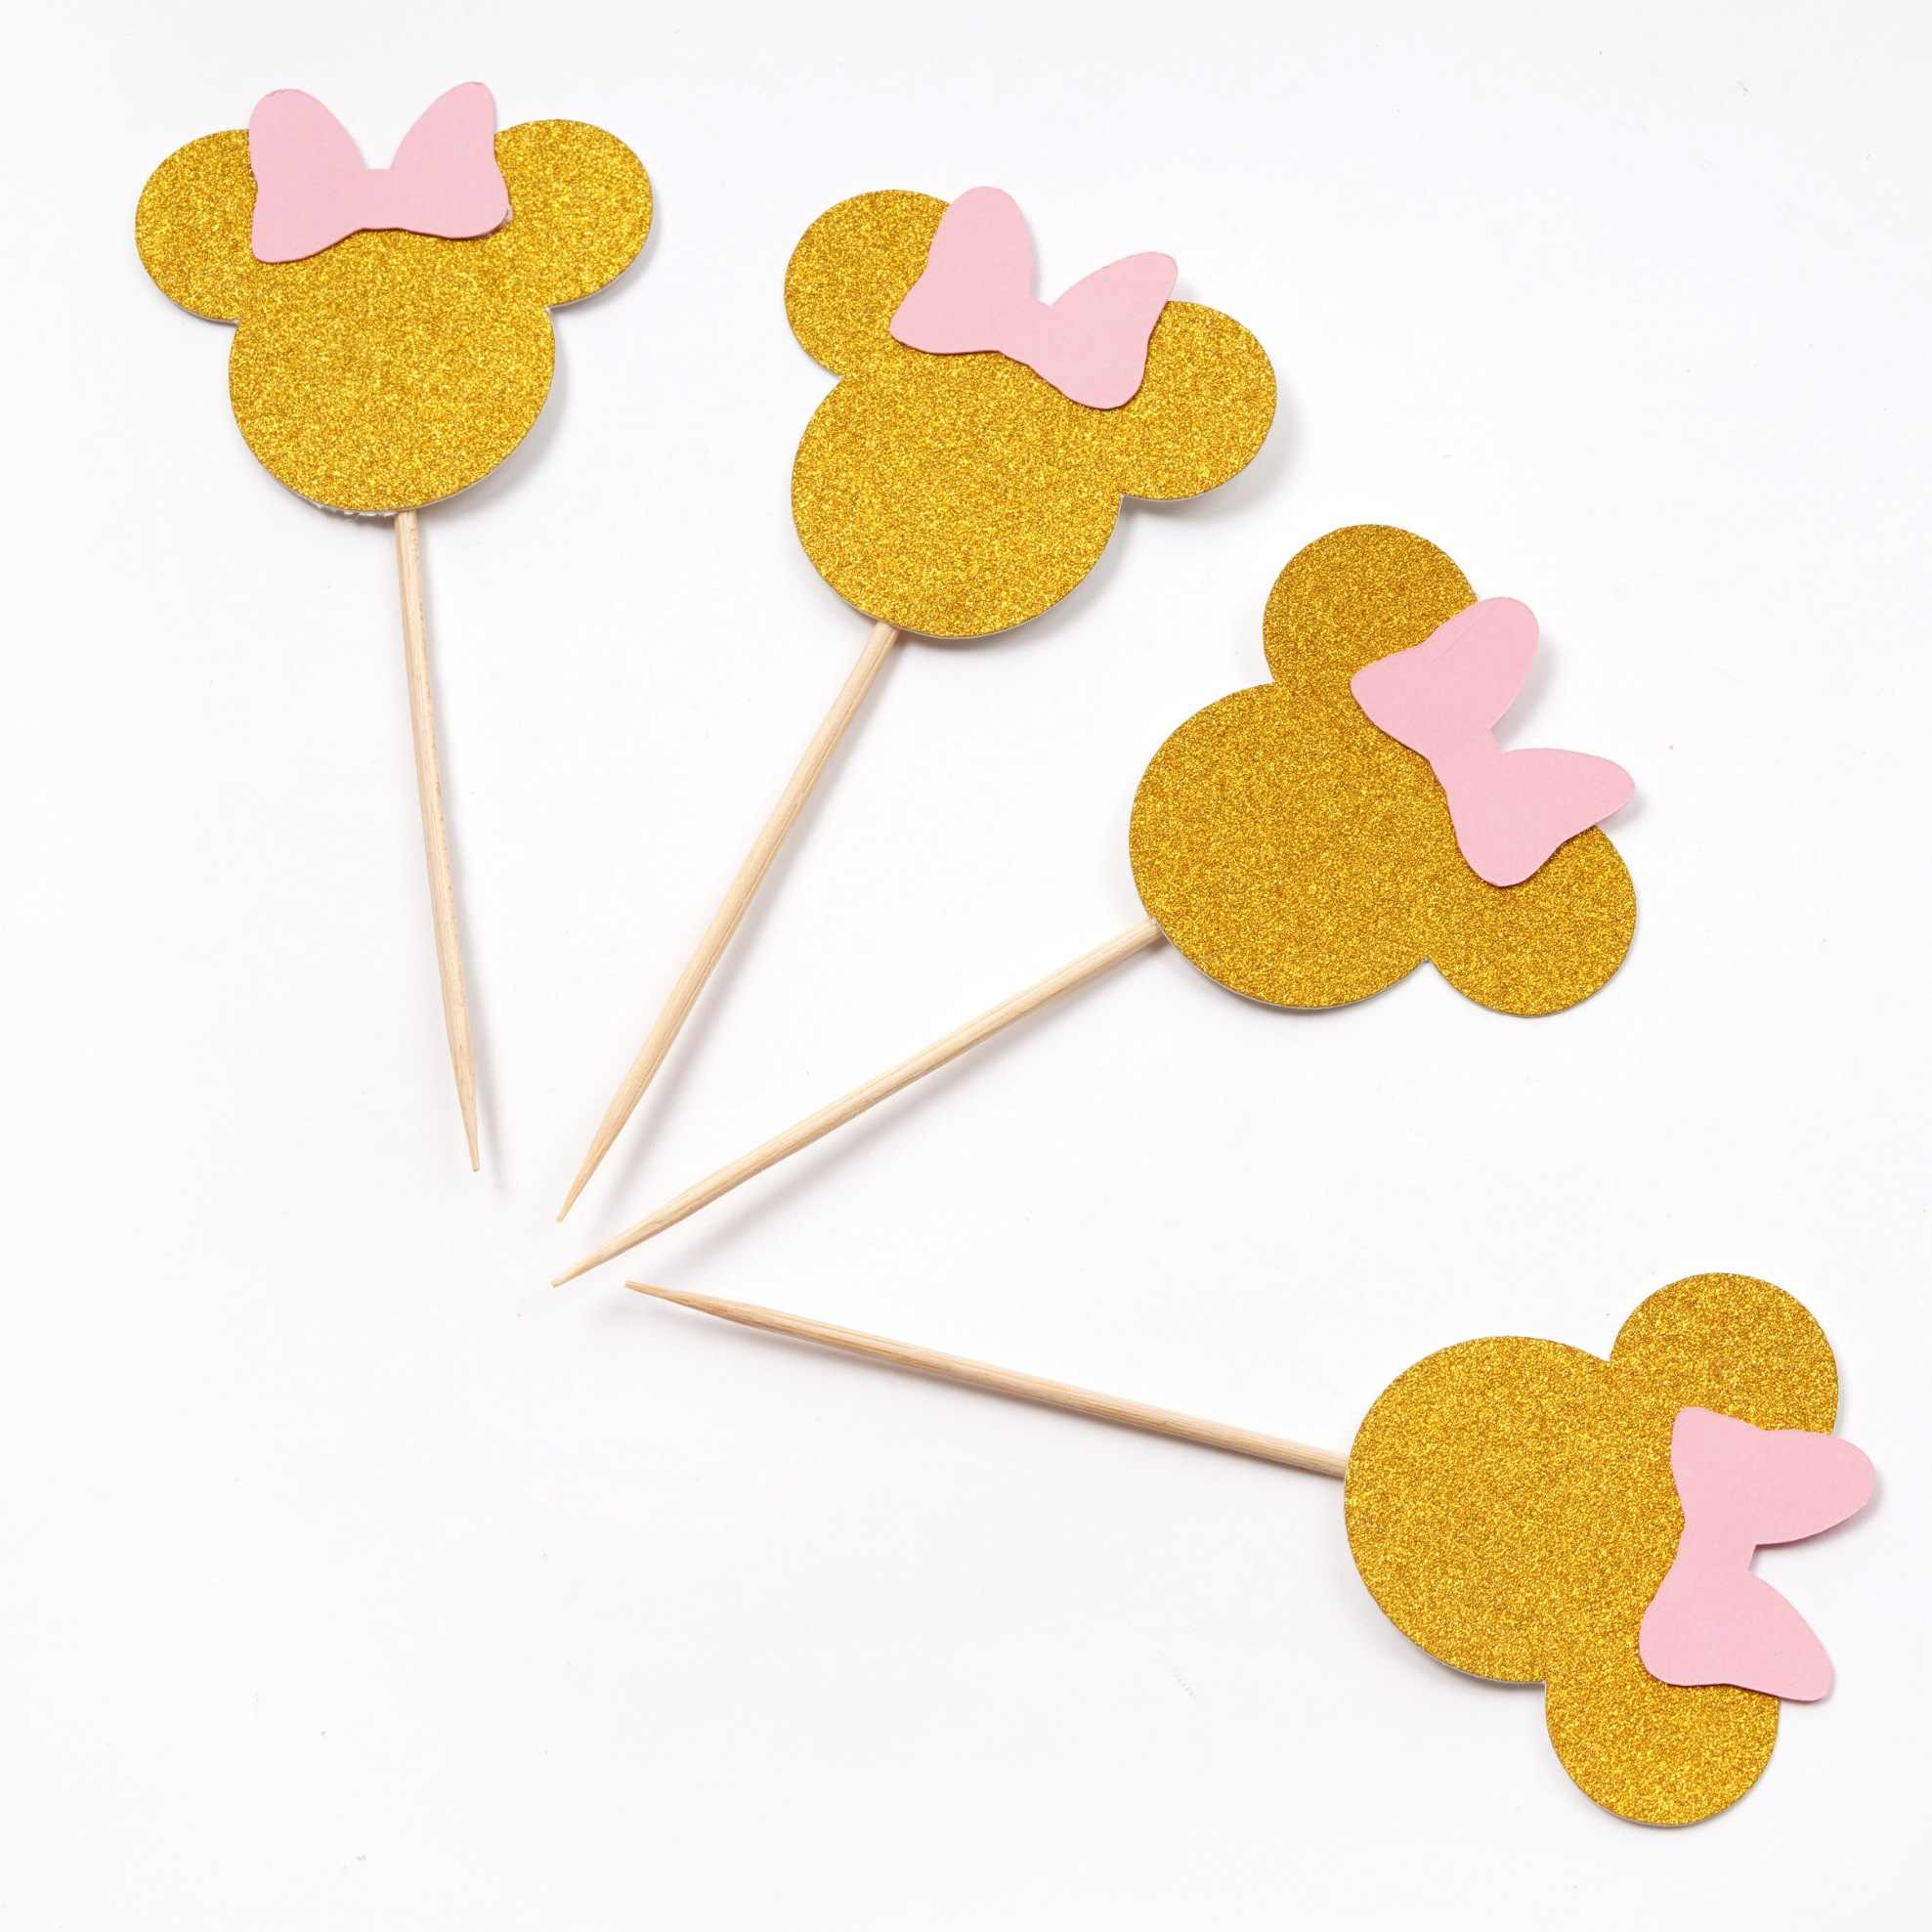 Miraculous 10Pcs Cartoon Minnie Mouse Birthday Party Cake Decorations Kids Funny Birthday Cards Online Necthendildamsfinfo